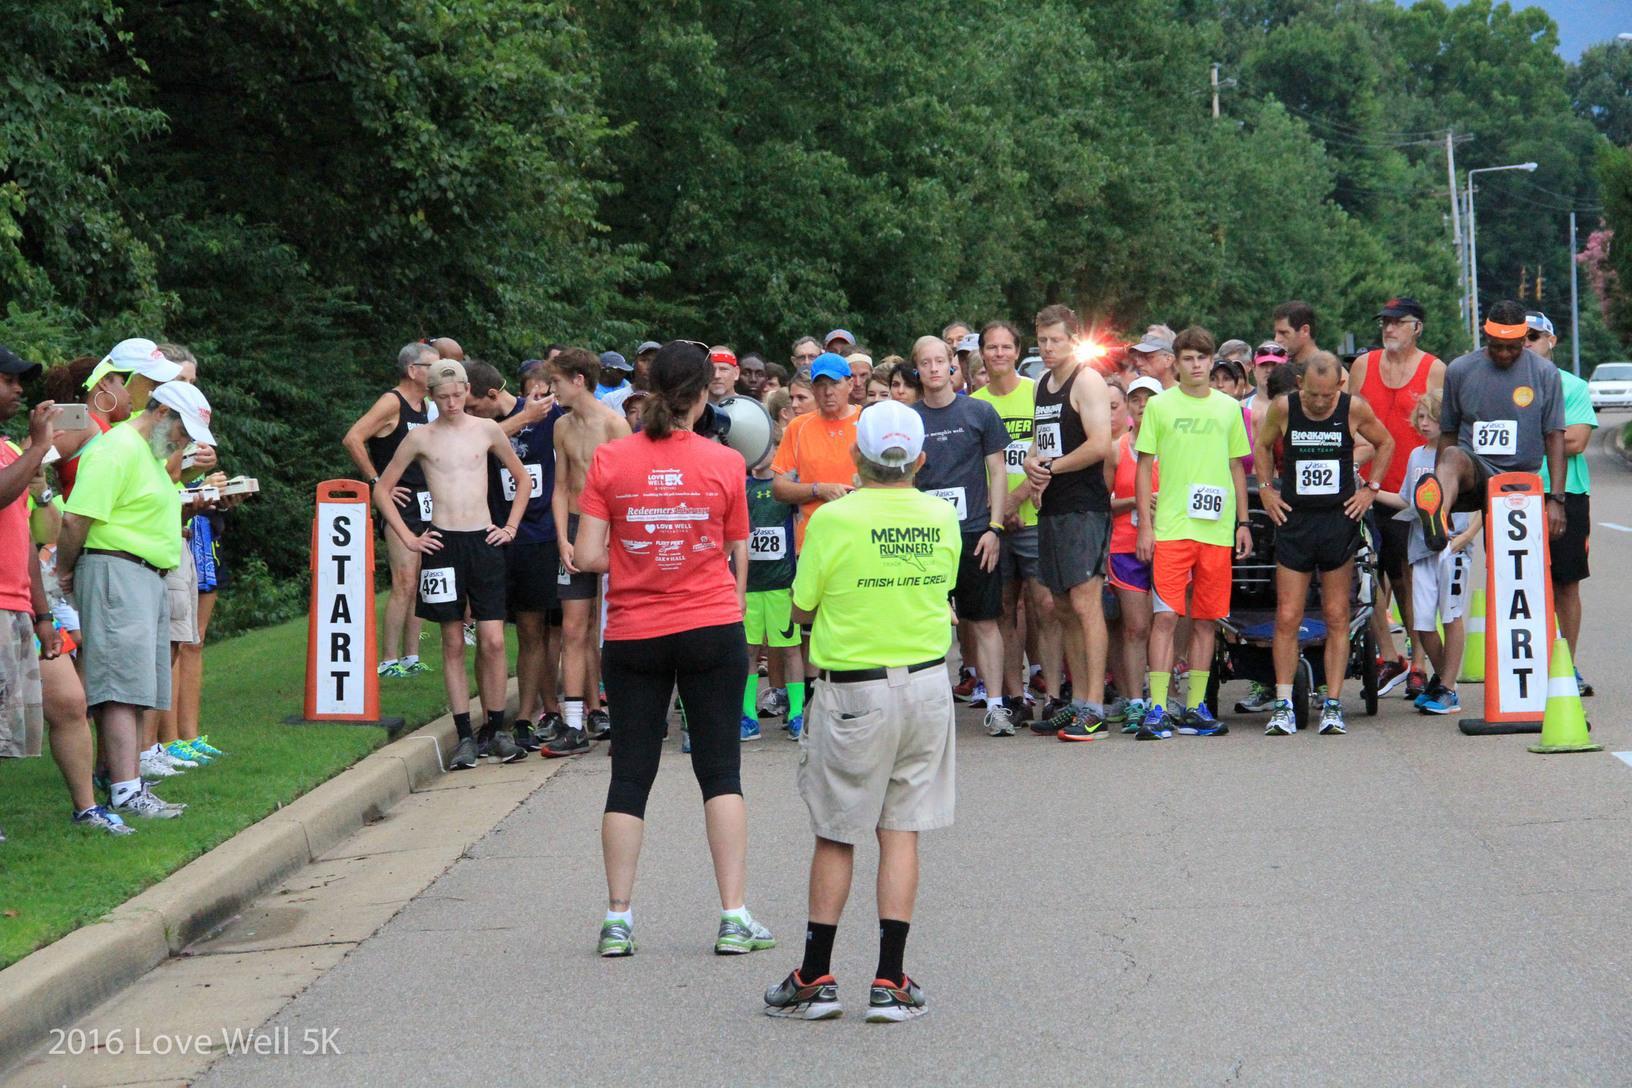 Love Well 5k Runners